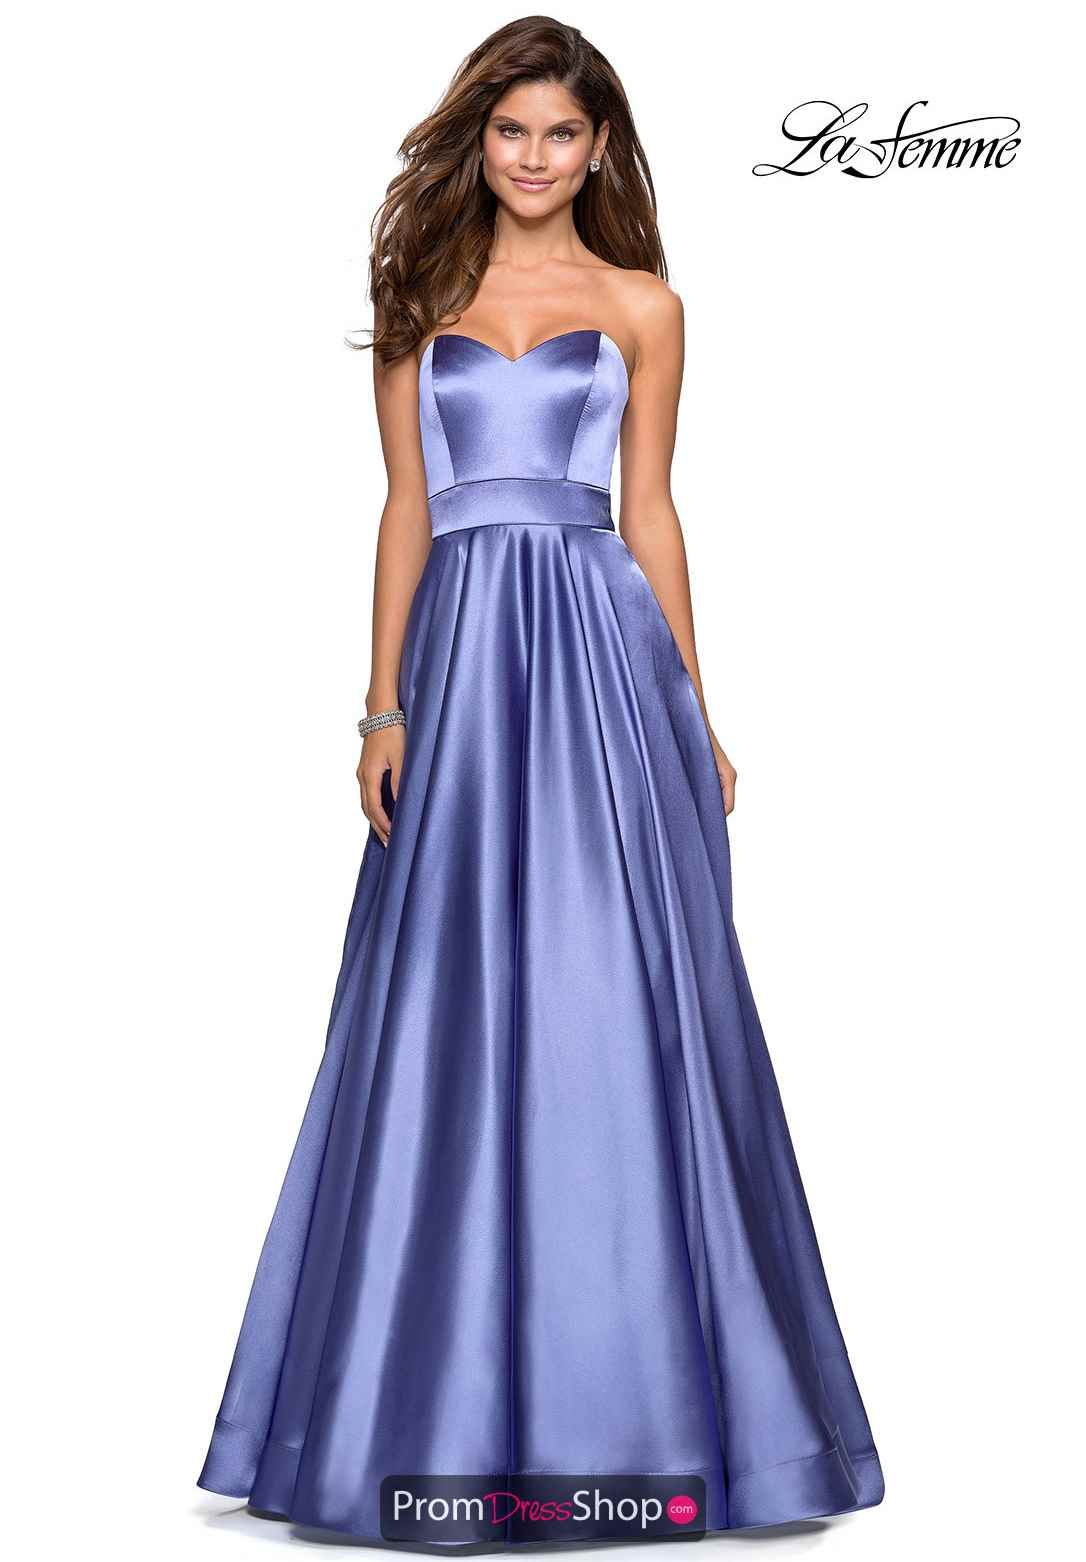 Dark Periwinkle Prom Dress